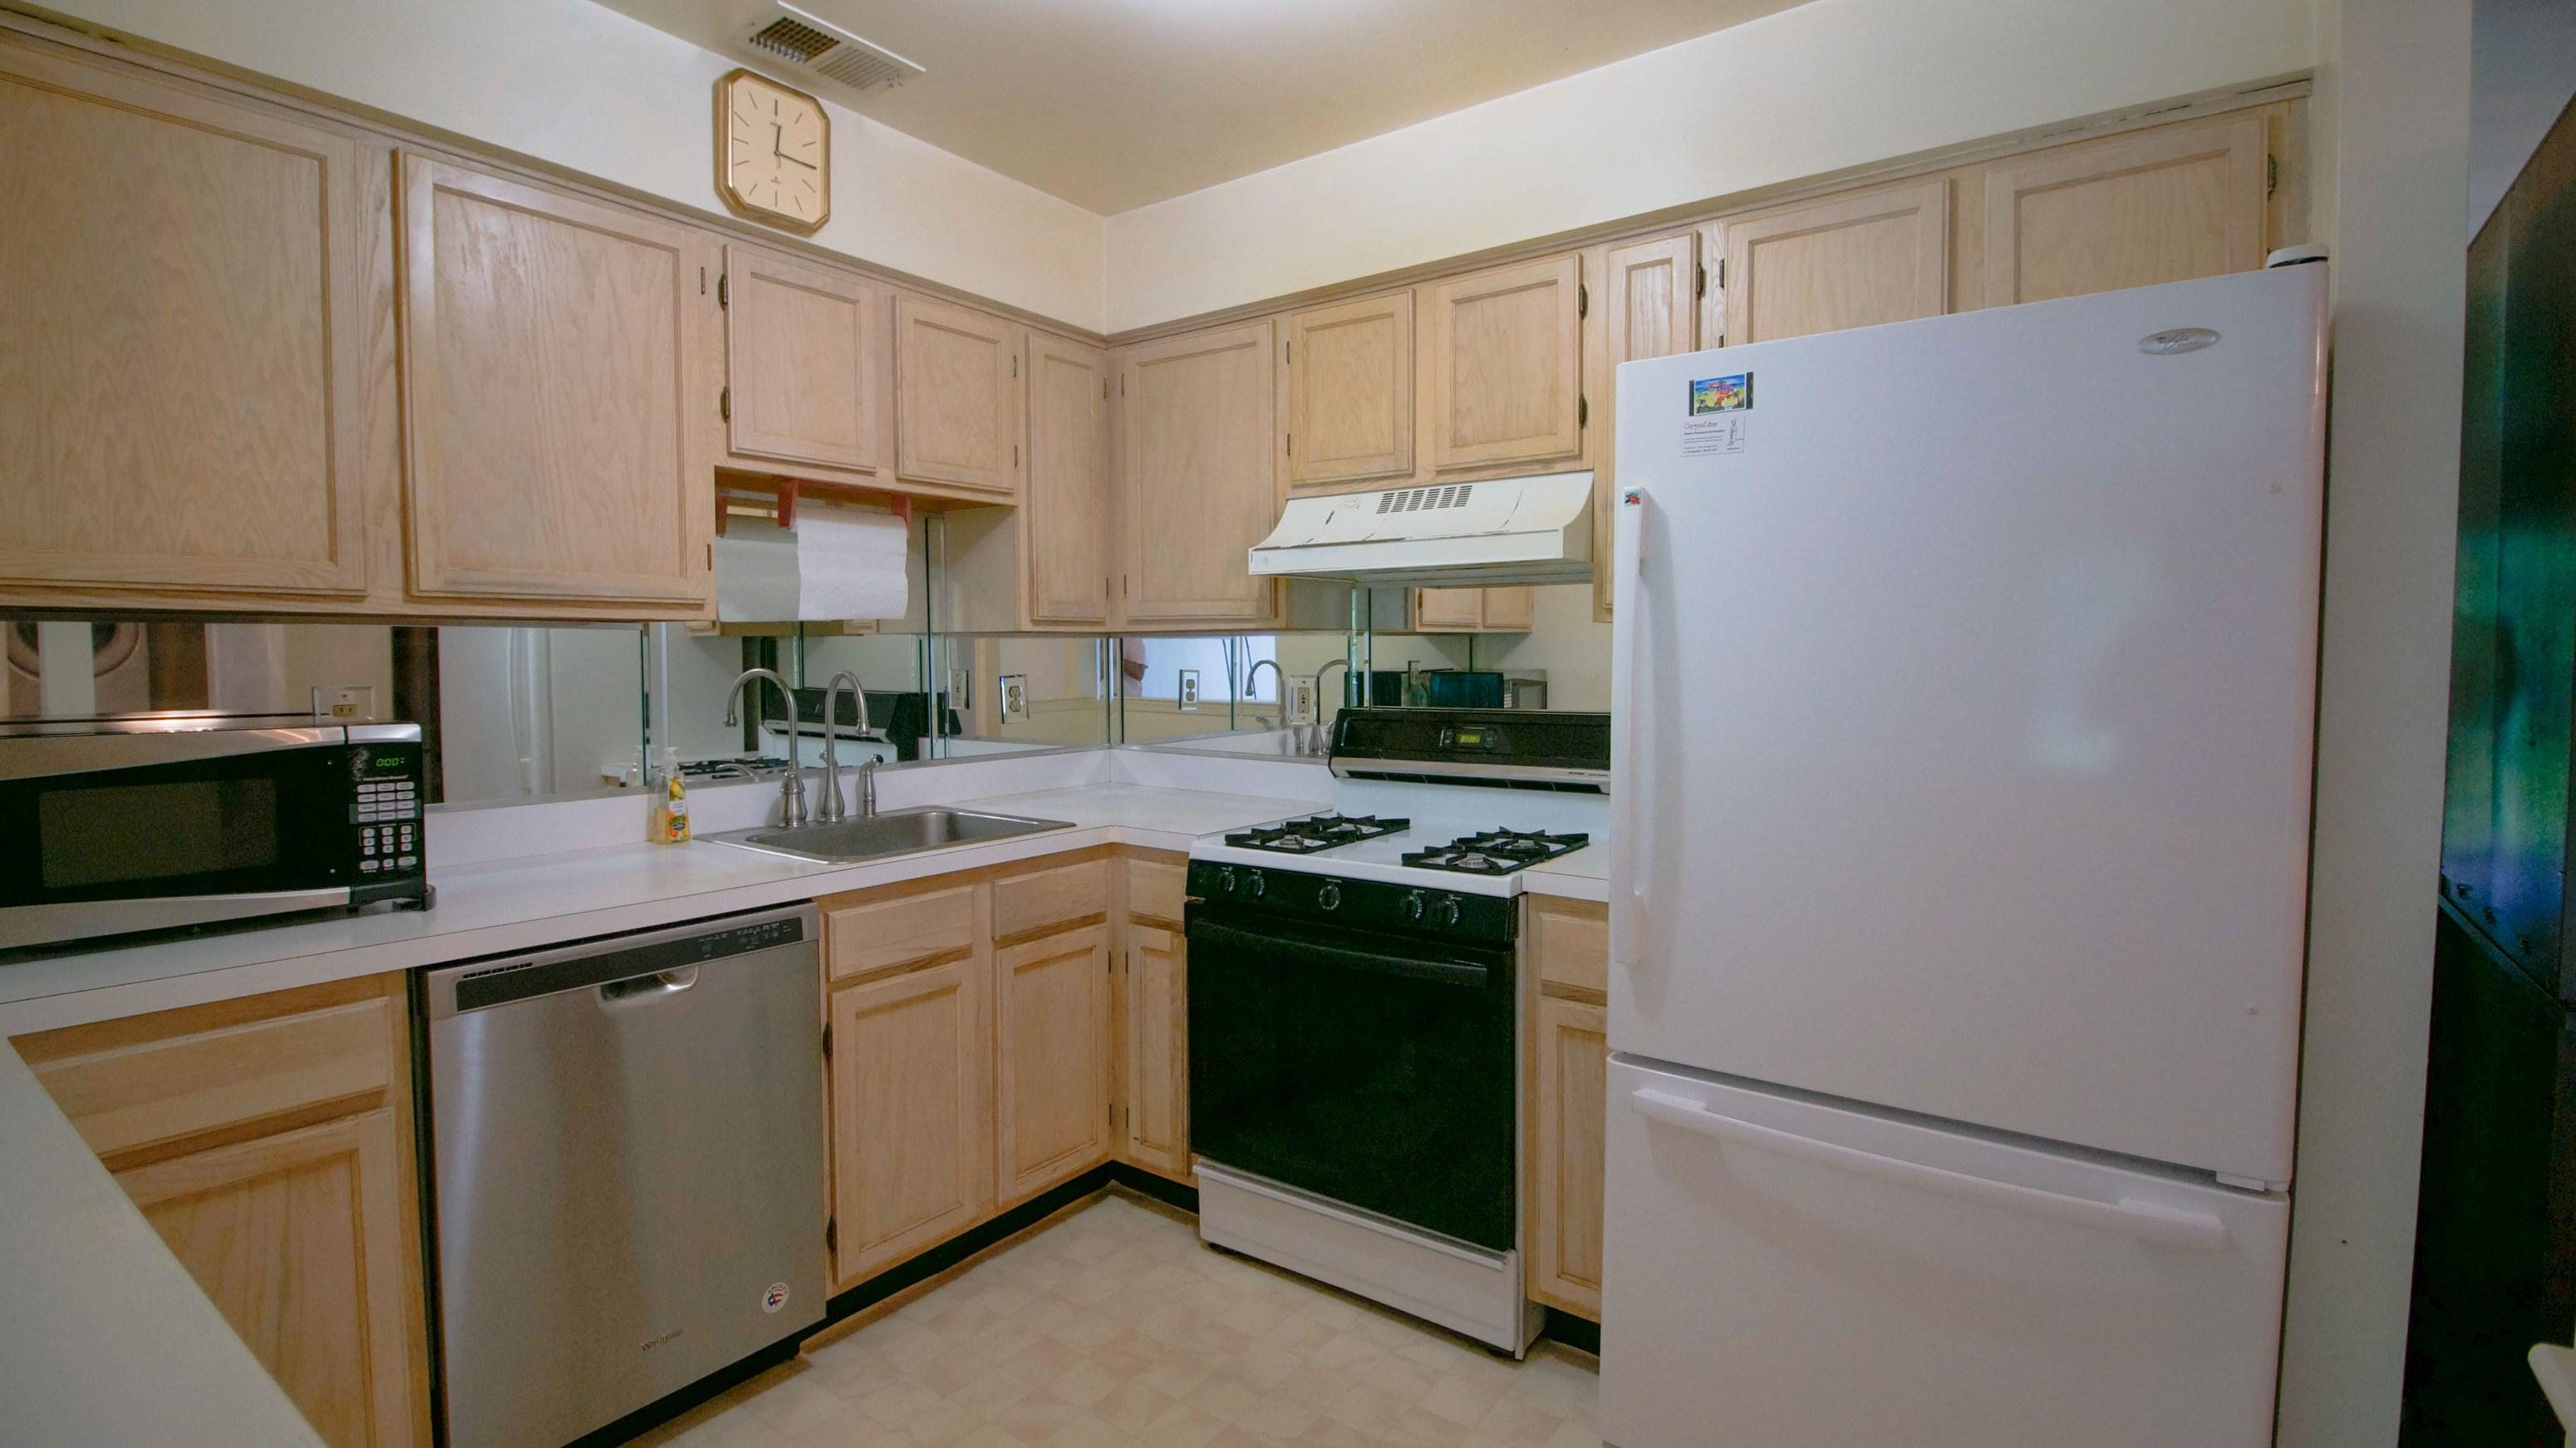 2BED, 2BATH Condo (1024 Waterford Drive) For Rent In Edison, NJ   2 BHK  Condo in Edison, NJ   1245738 - Sulekha Rentals